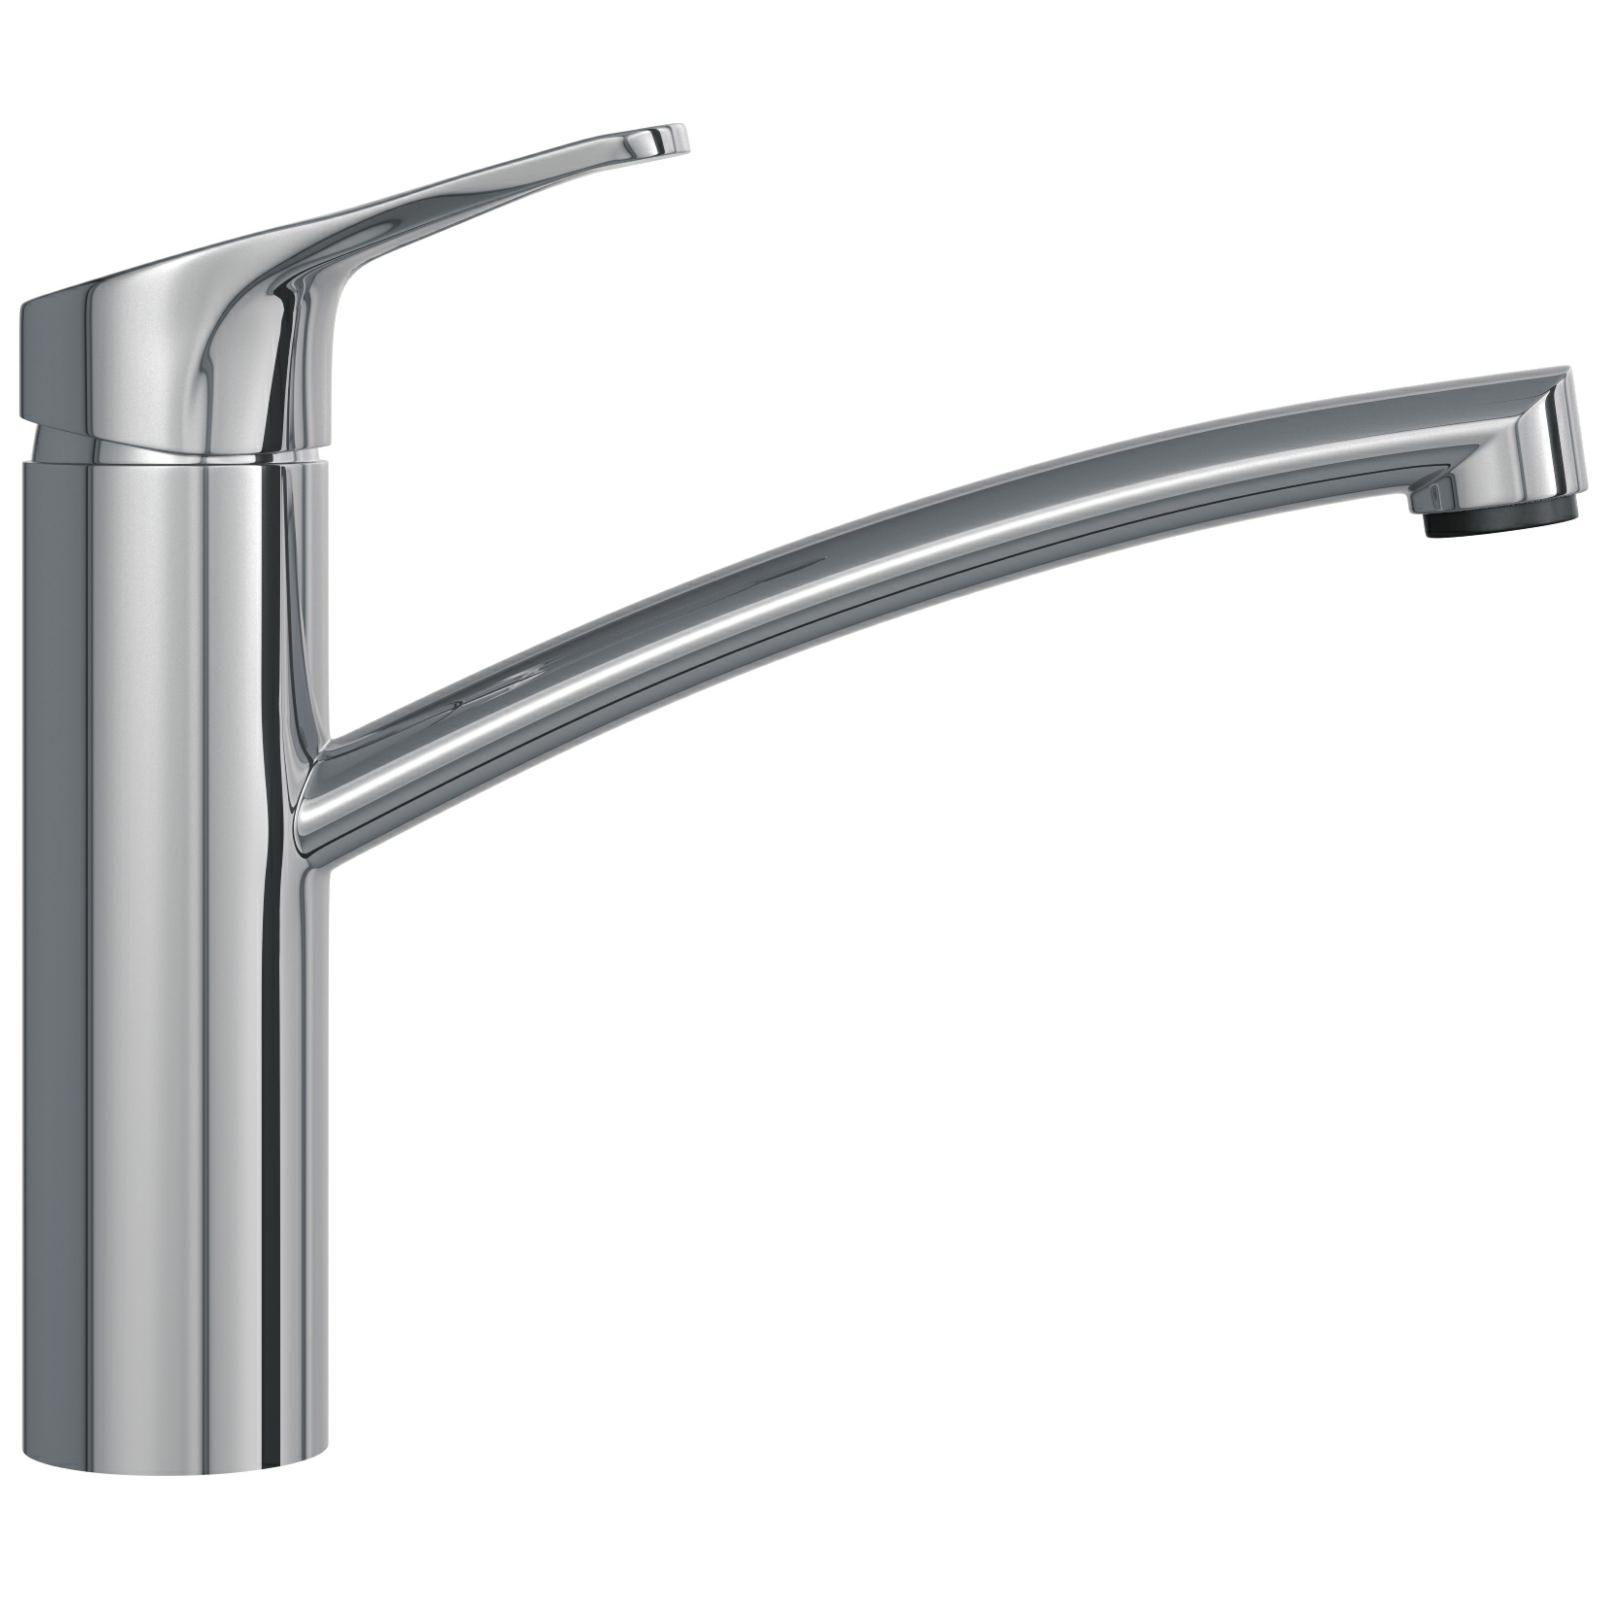 Franke Smart Chrome Kitchen Sink Mixer Tap